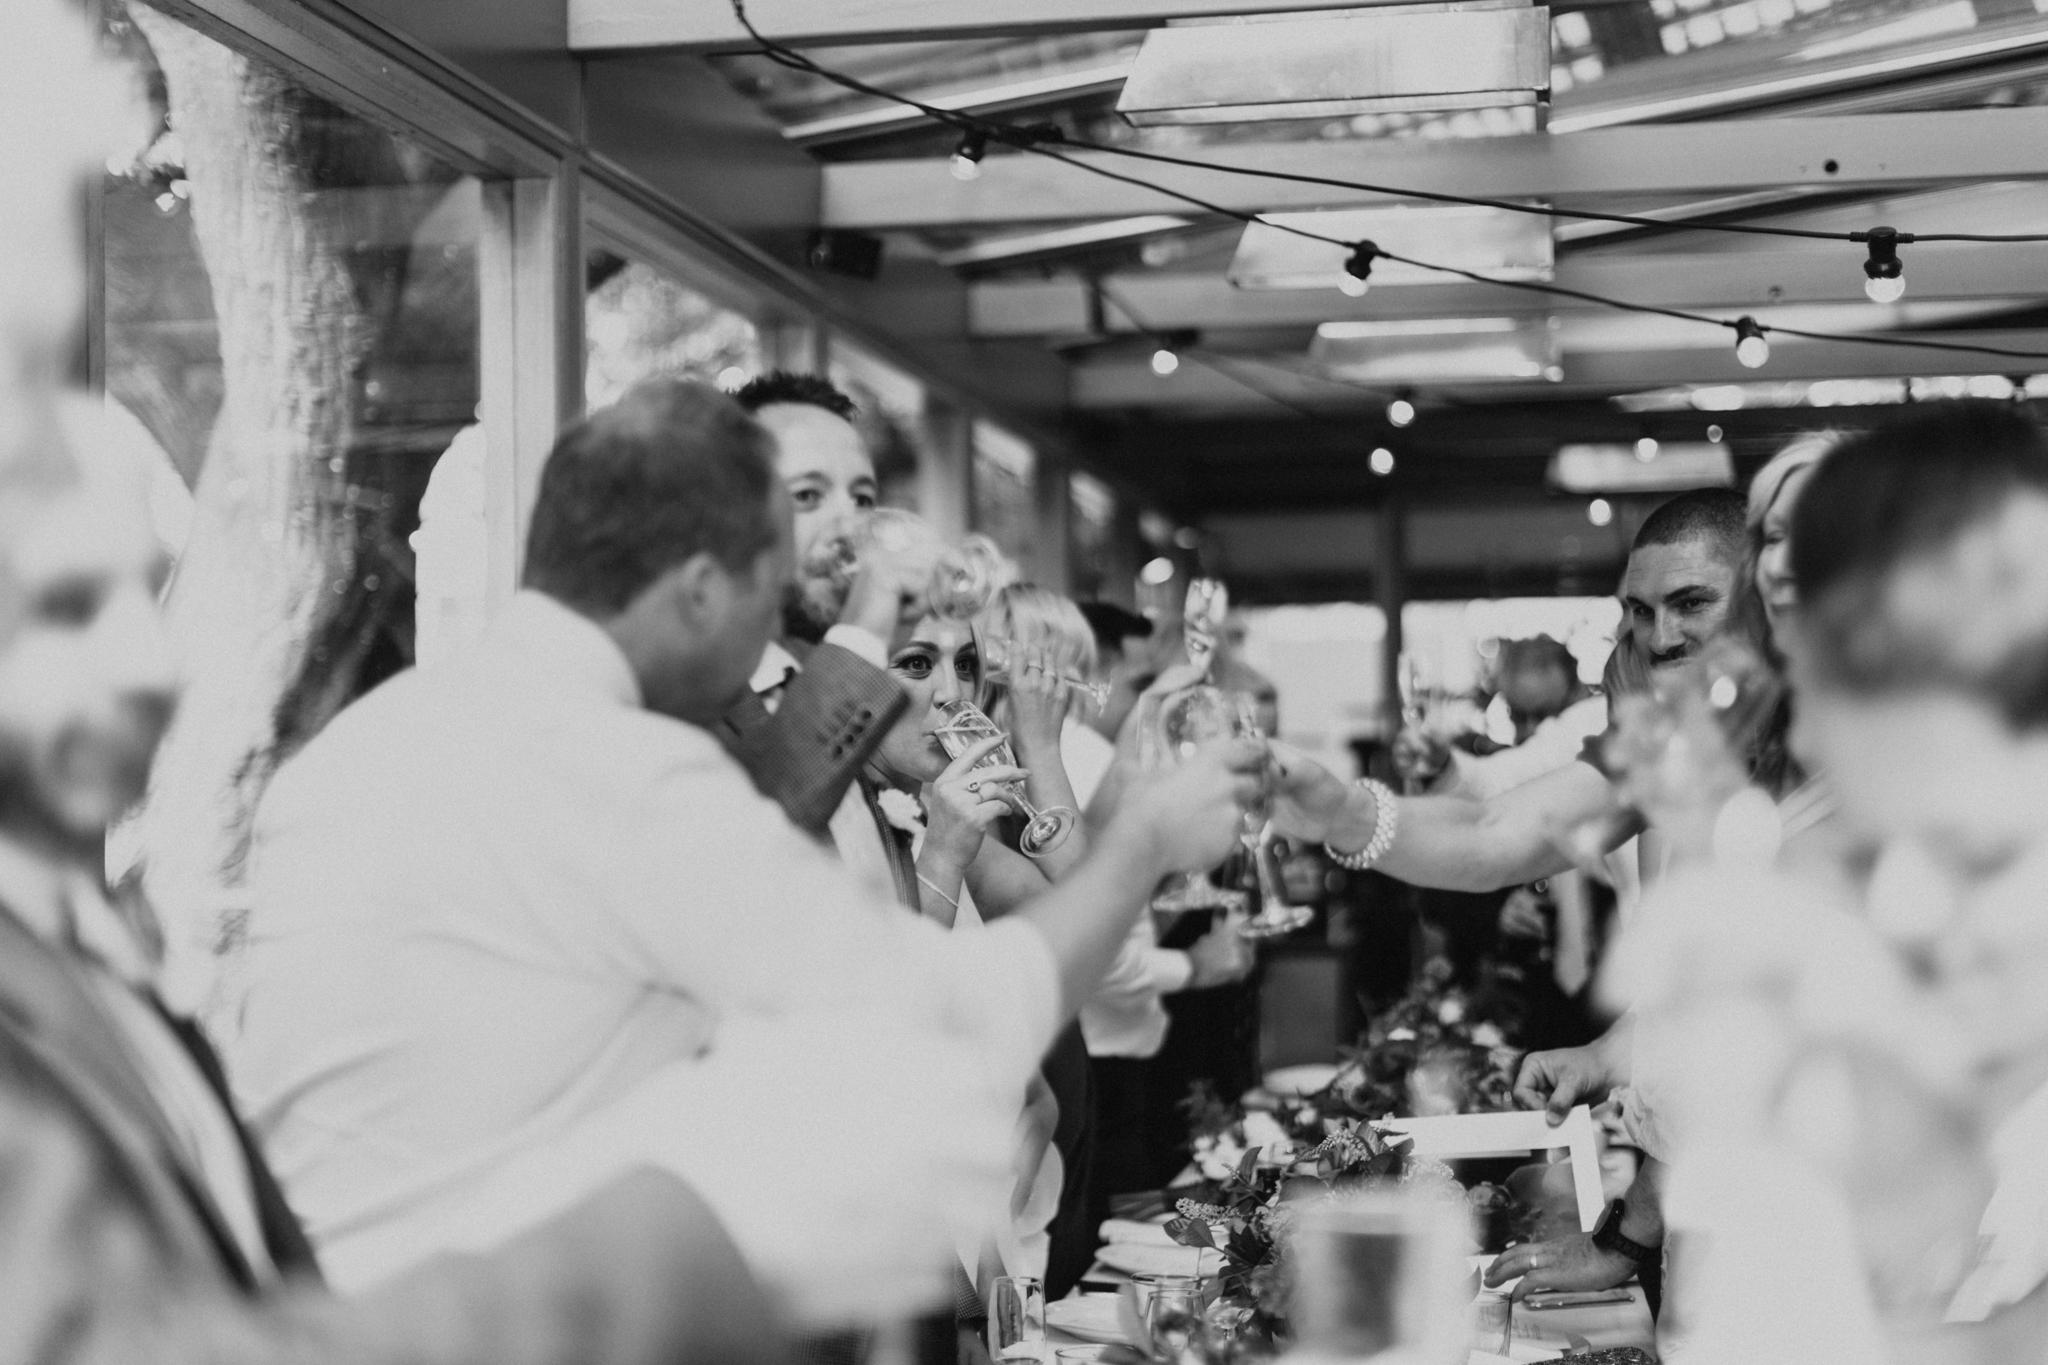 Trunk-restaurant-wedding-EmotionsandMath-078.jpg